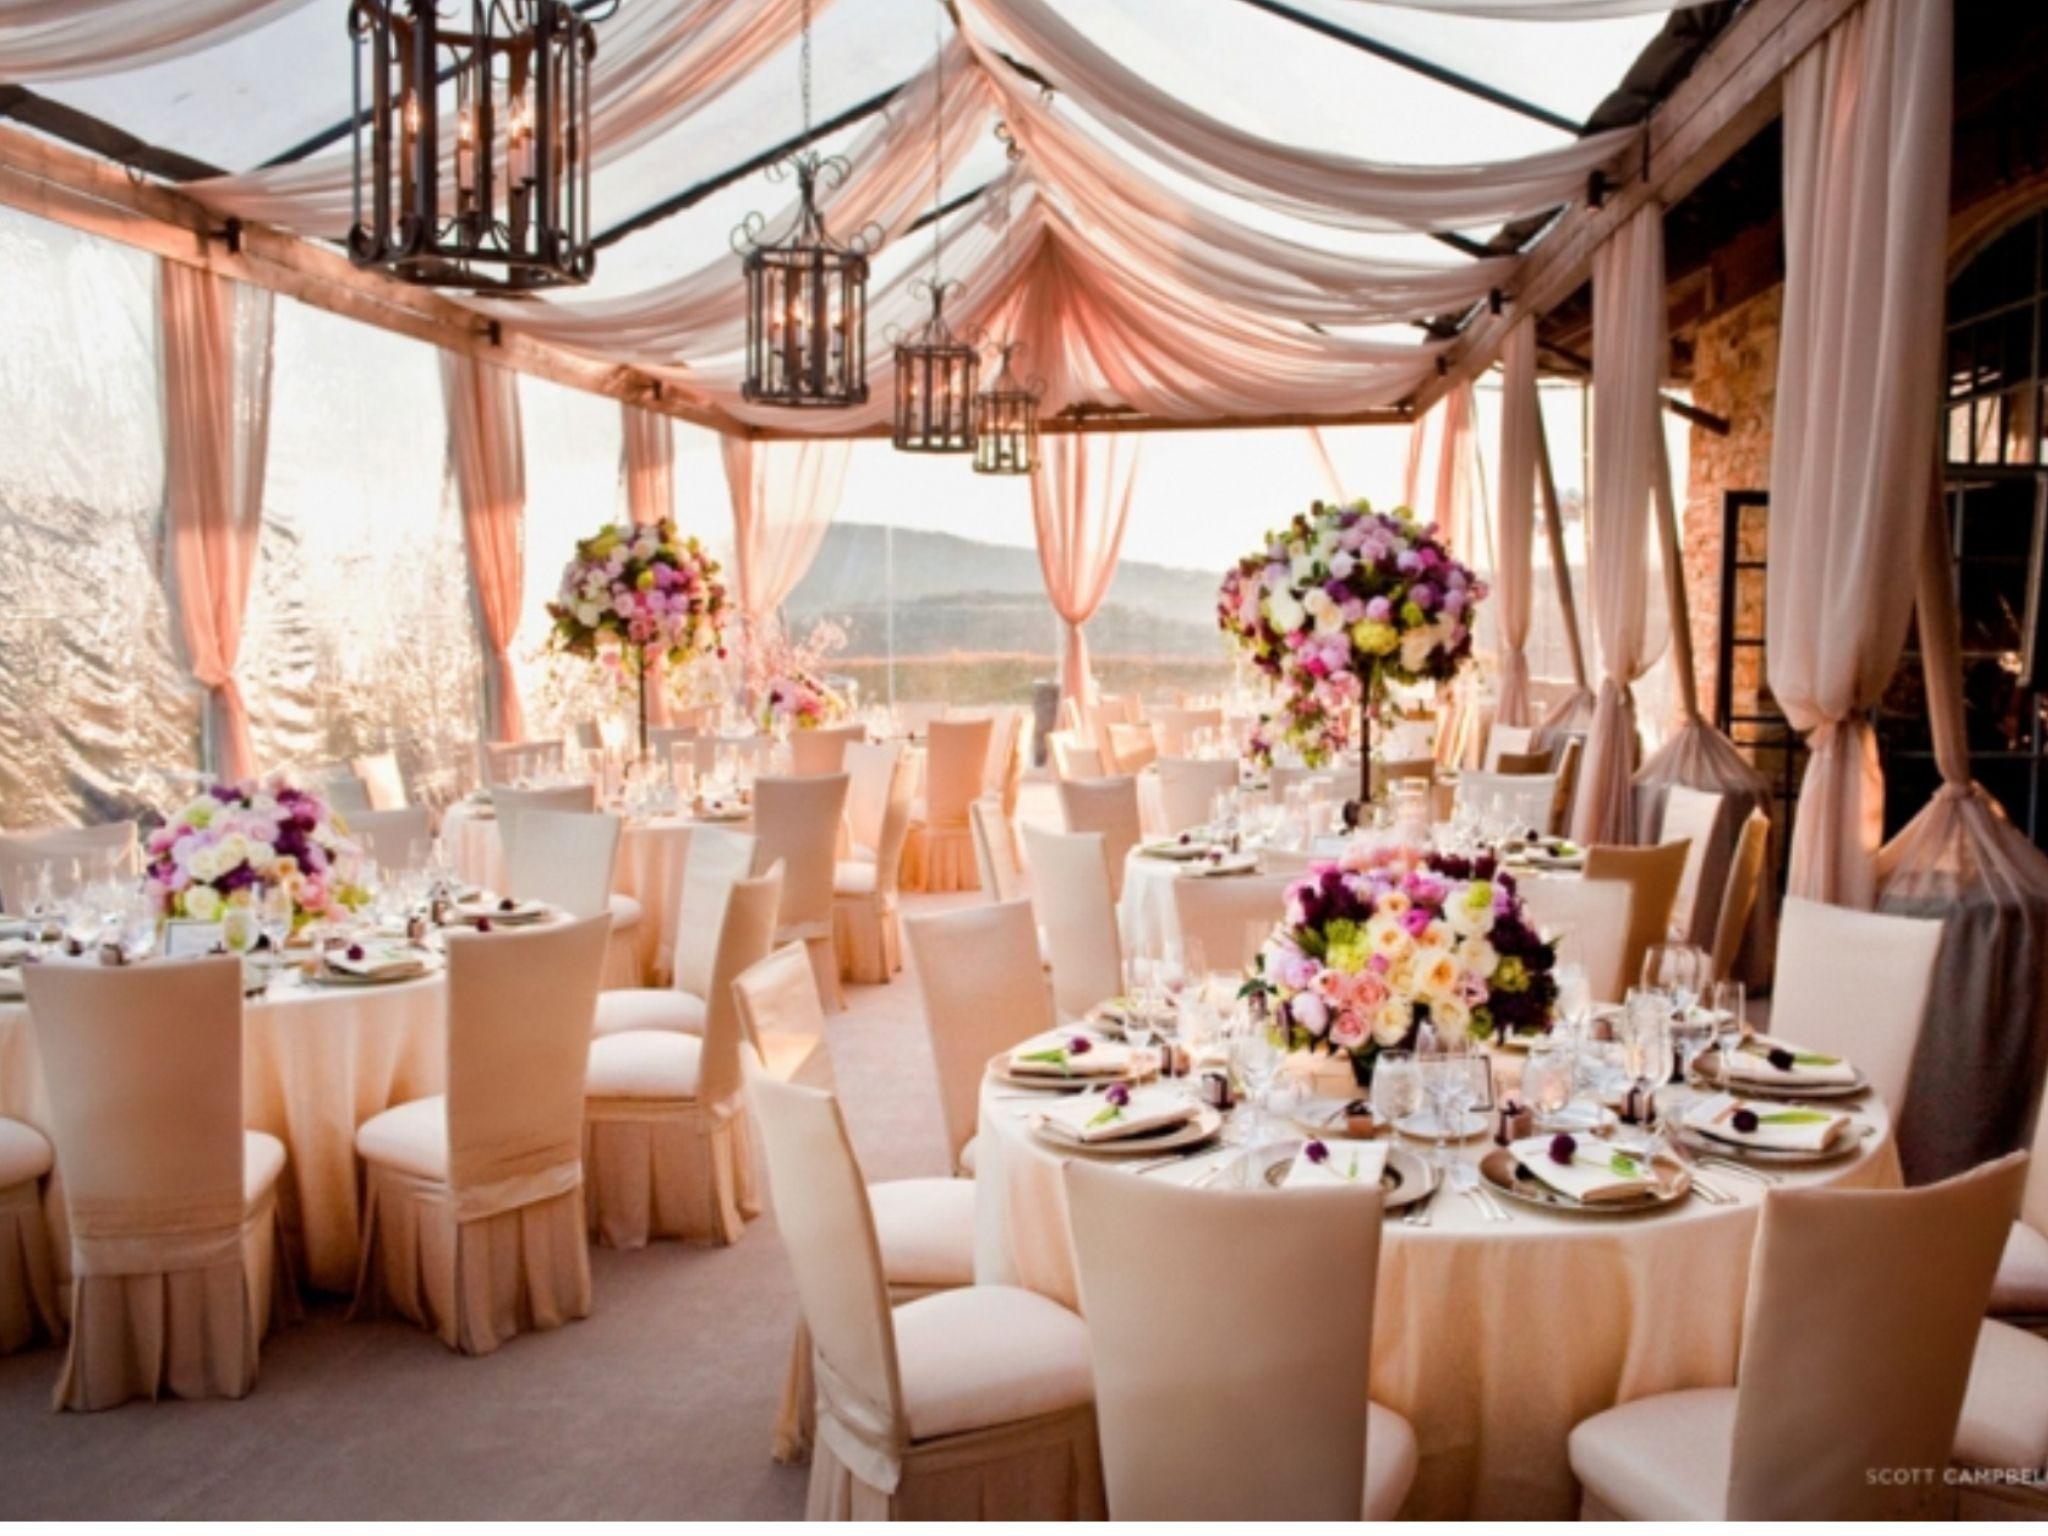 Wedding tent decoration images  Chairsautiful  Wedding Ideas  Pinterest  Weddings